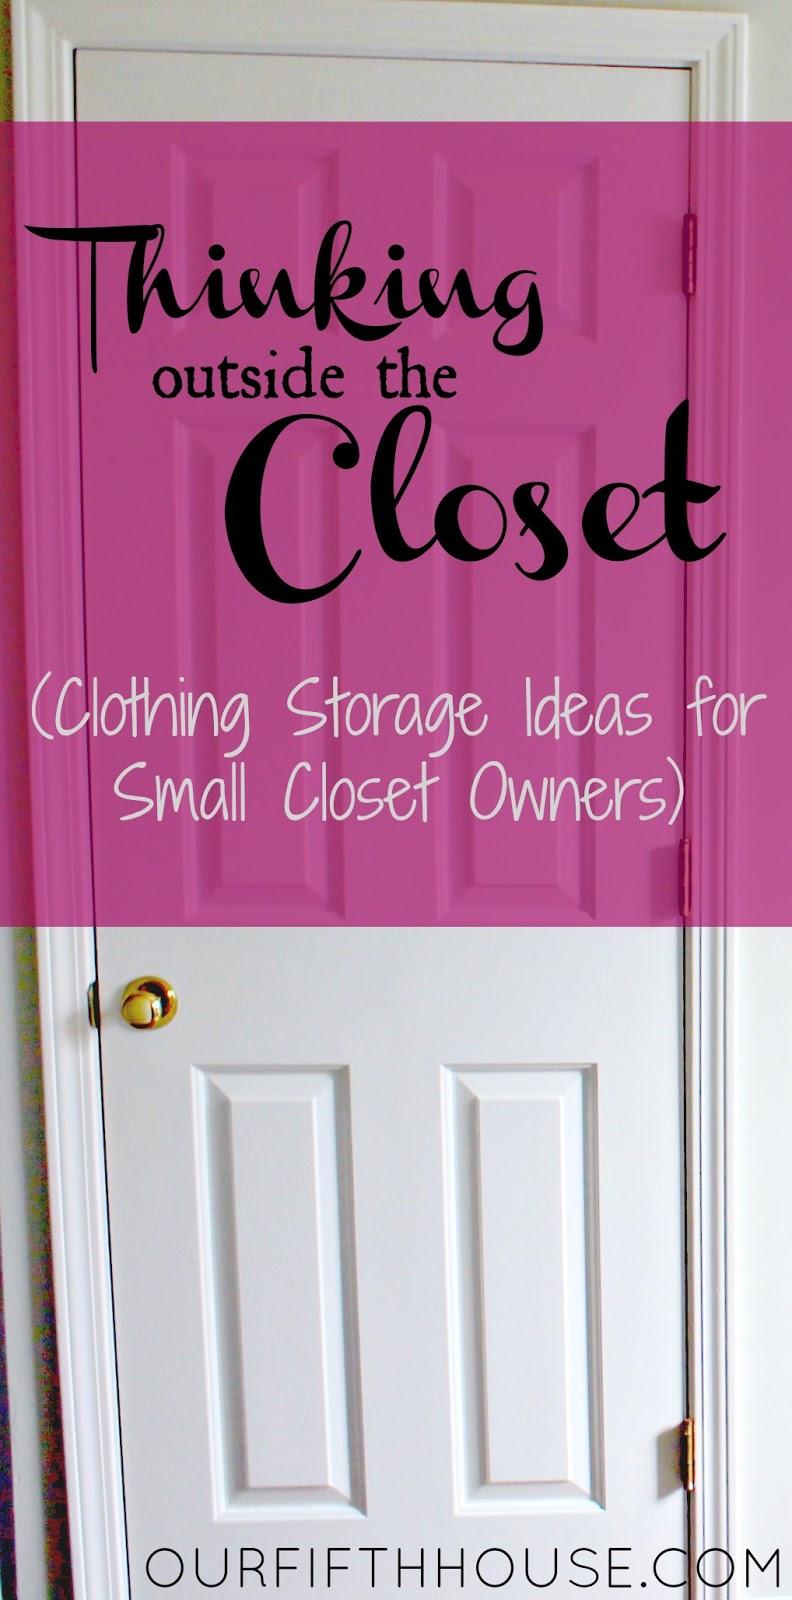 Diy clothes ideas for girls top 10 diy organization ideas - Diy clothes storage ideas ...